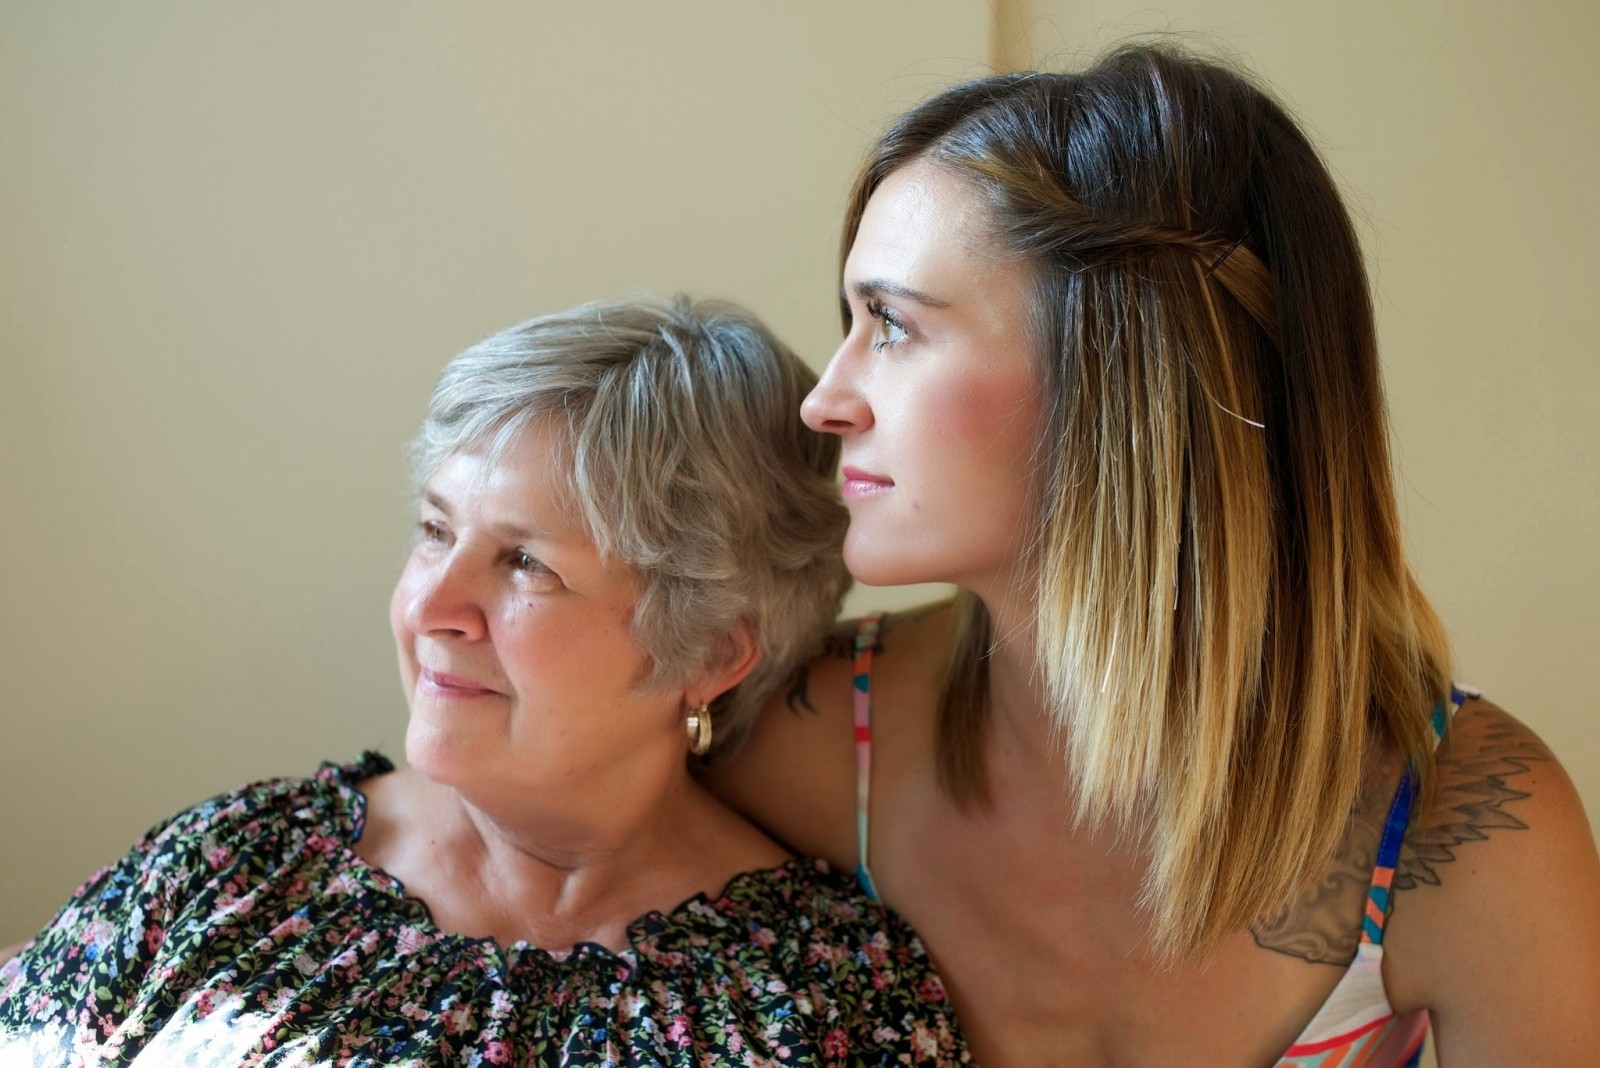 family-mother-daughter-women-female-woman-girl